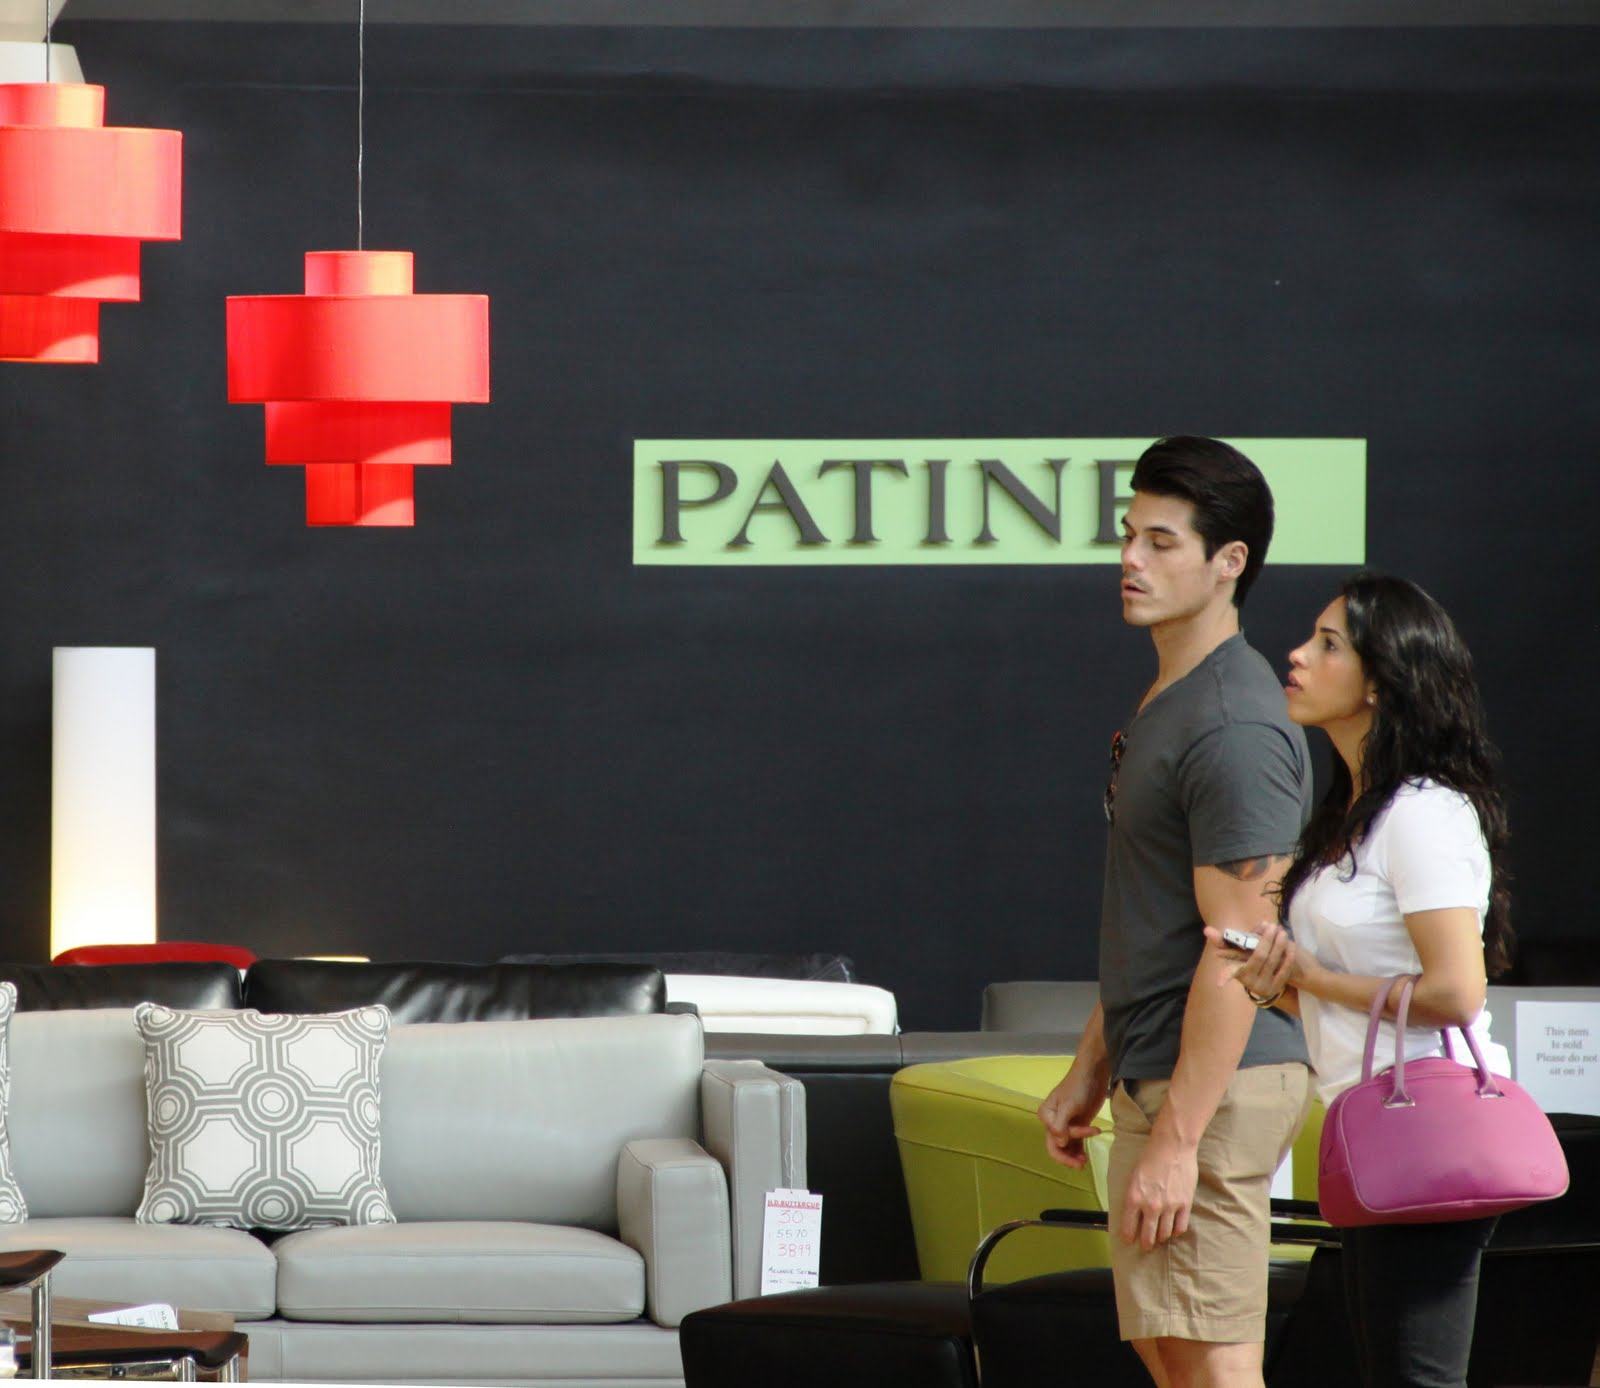 Palos Verdes Daily Photo Having A Patine Moment